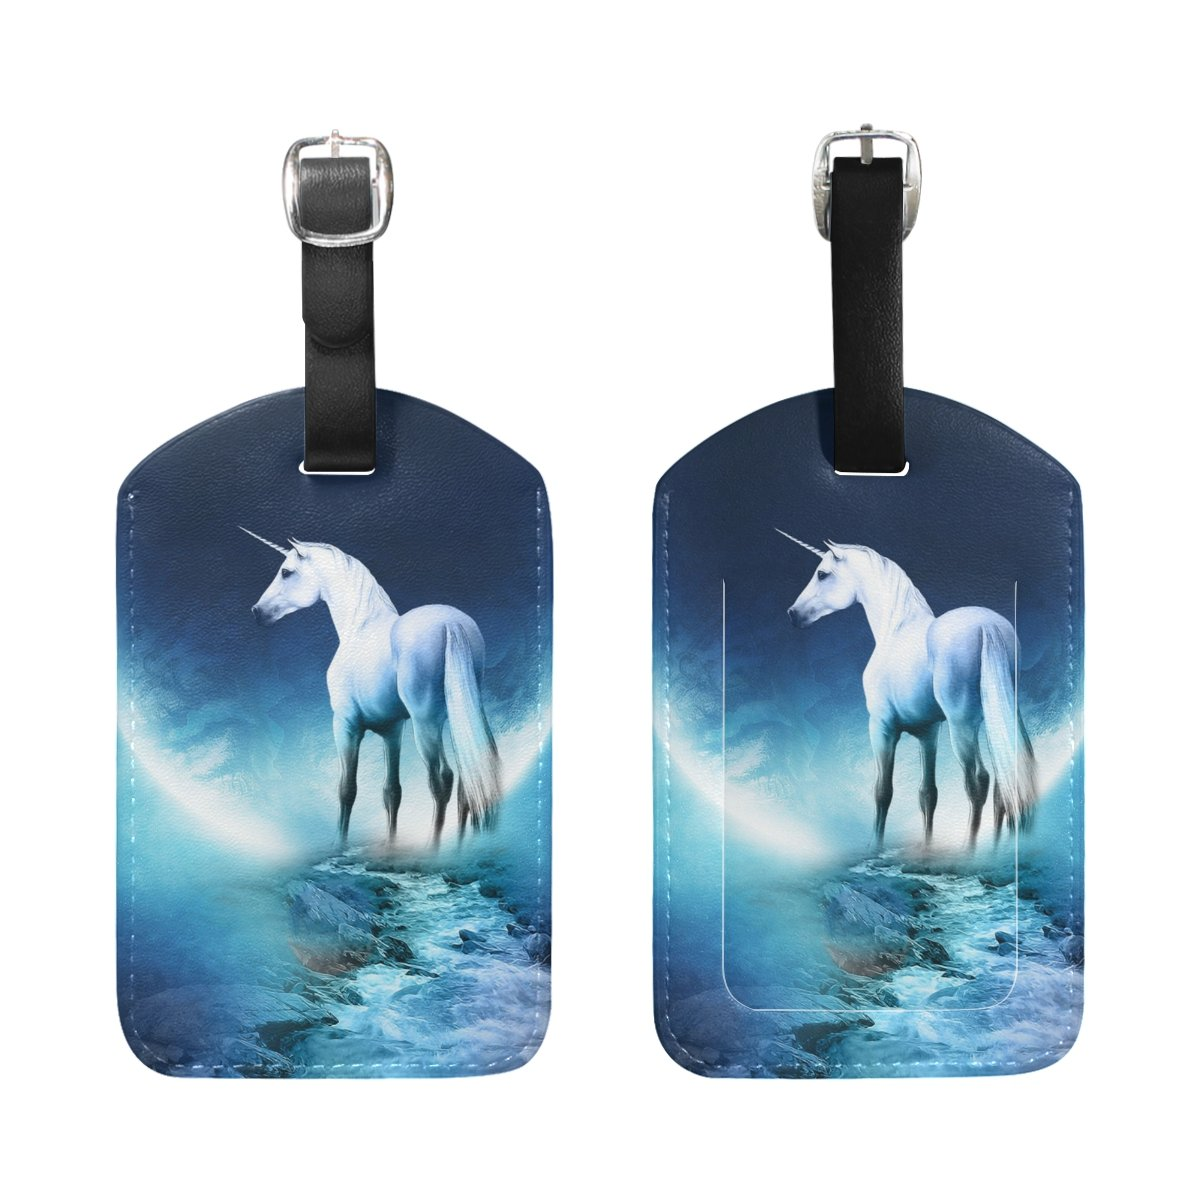 Saobao Travel Luggage Tag White Unicorn PU Leather Baggage Suitcase Travel ID Bag Tag 1Pcs